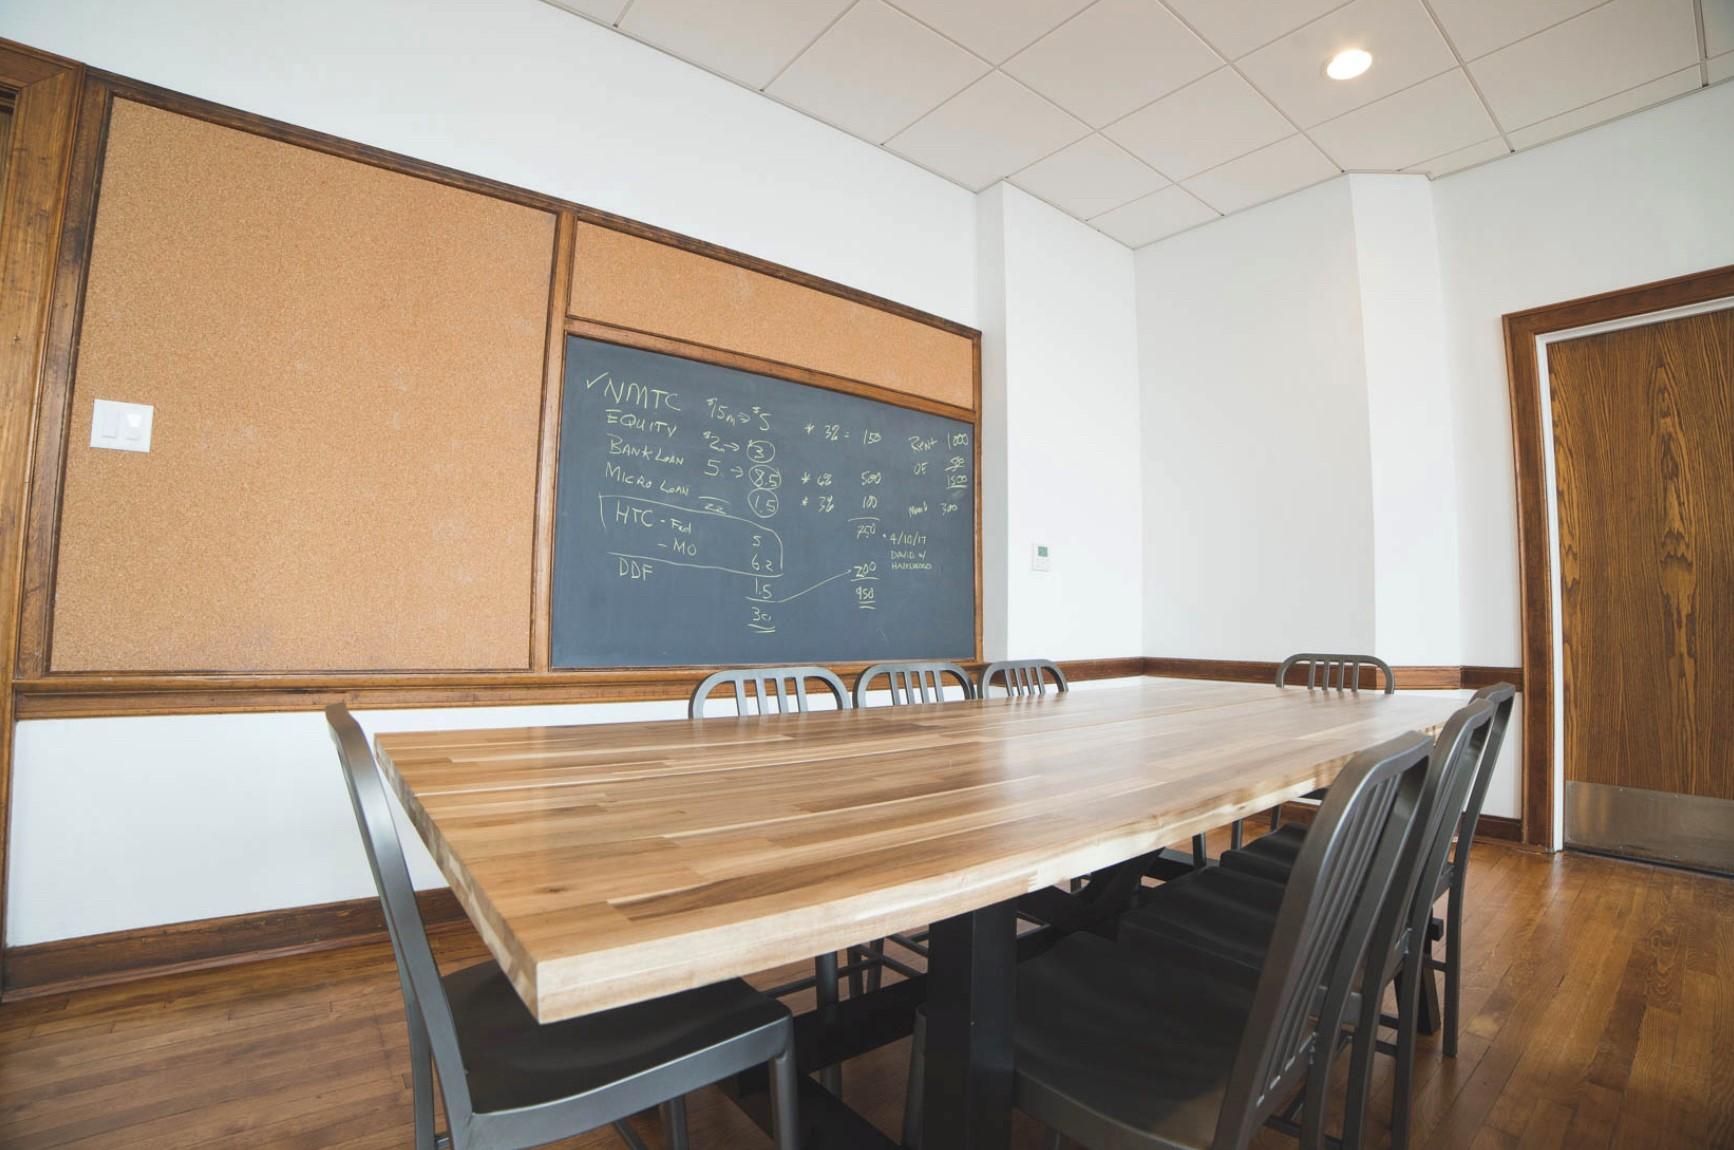 plexpod classroom with chalkboard.jpg